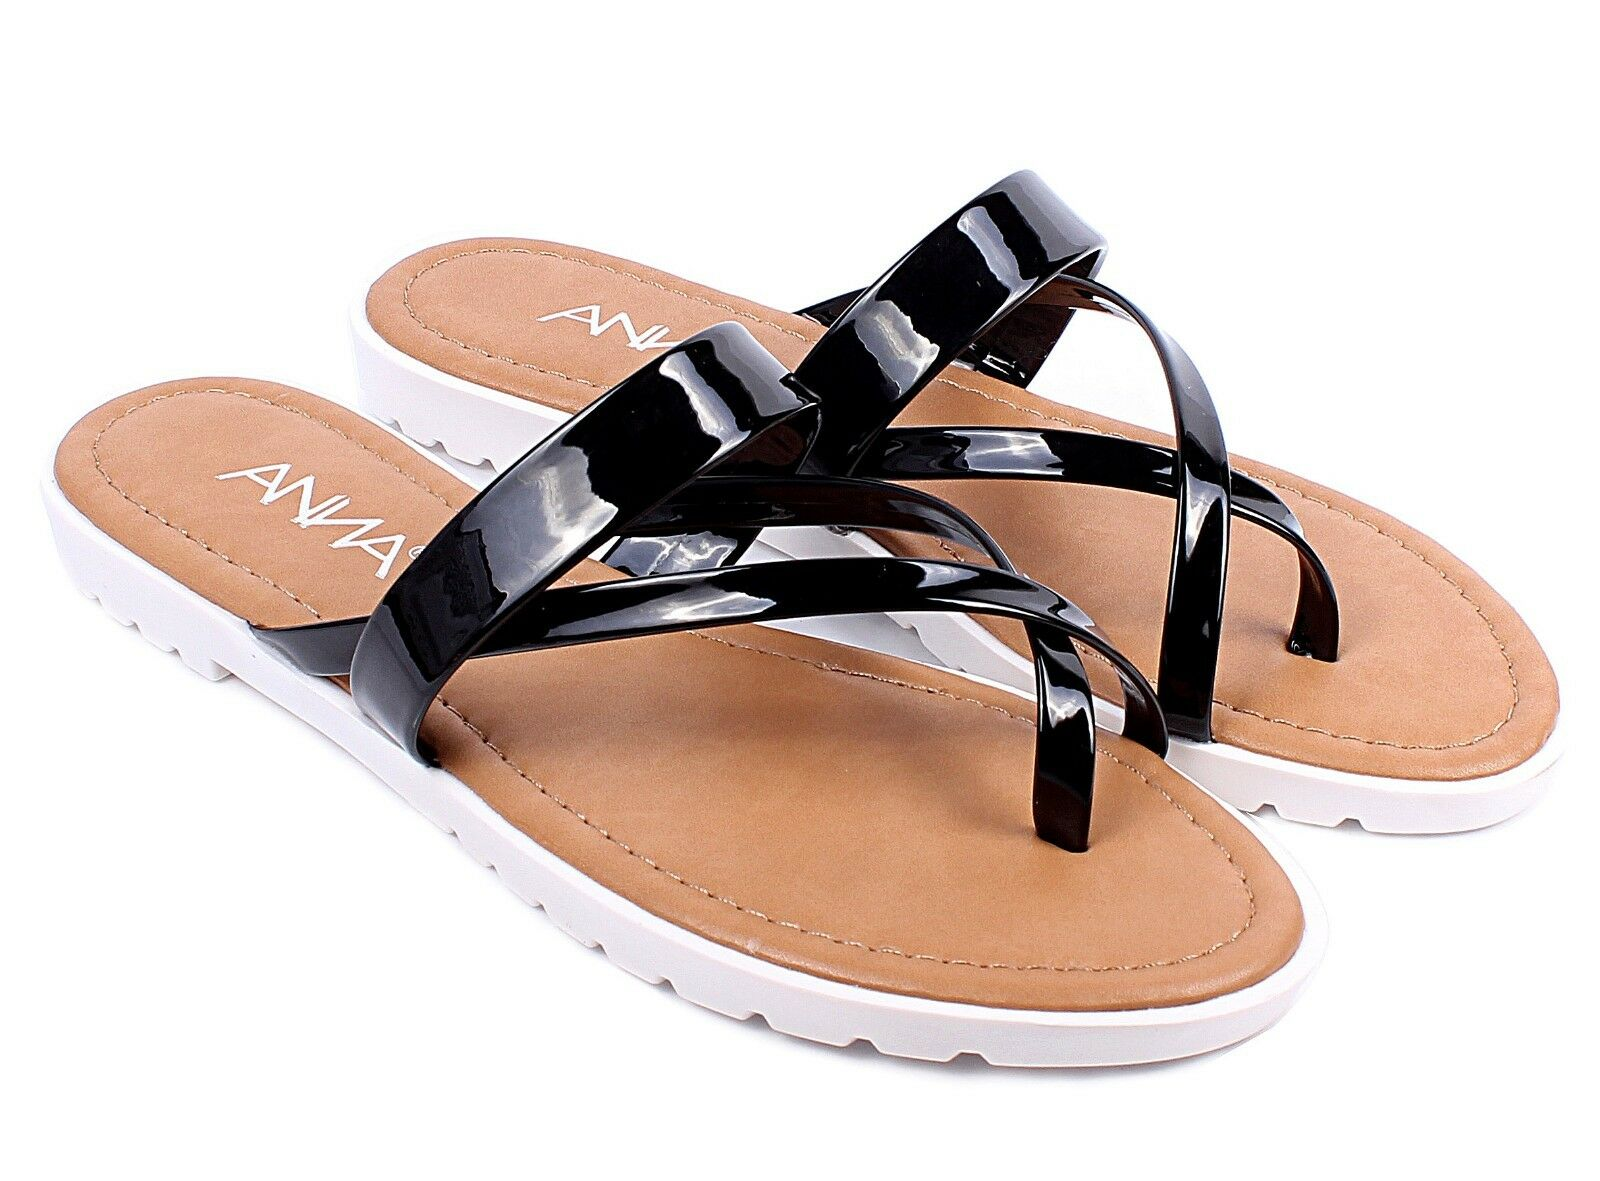 Black Casual Slip On Home Outside Stylish Women 6 Flip Flops Sandals Size 6 Women - 10 a284a7